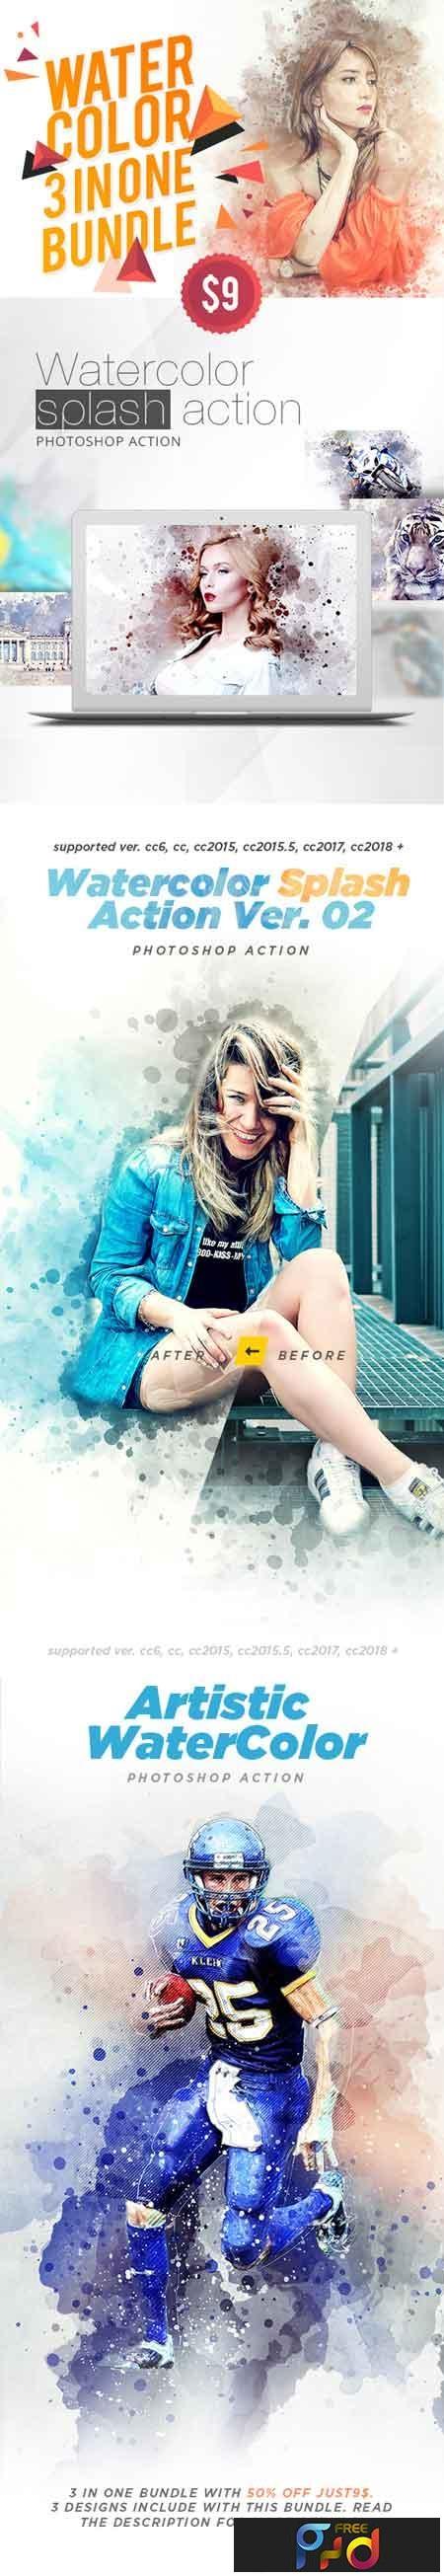 WaterColor 3 IN 1 Bundle Photoshop Action 22618267 1